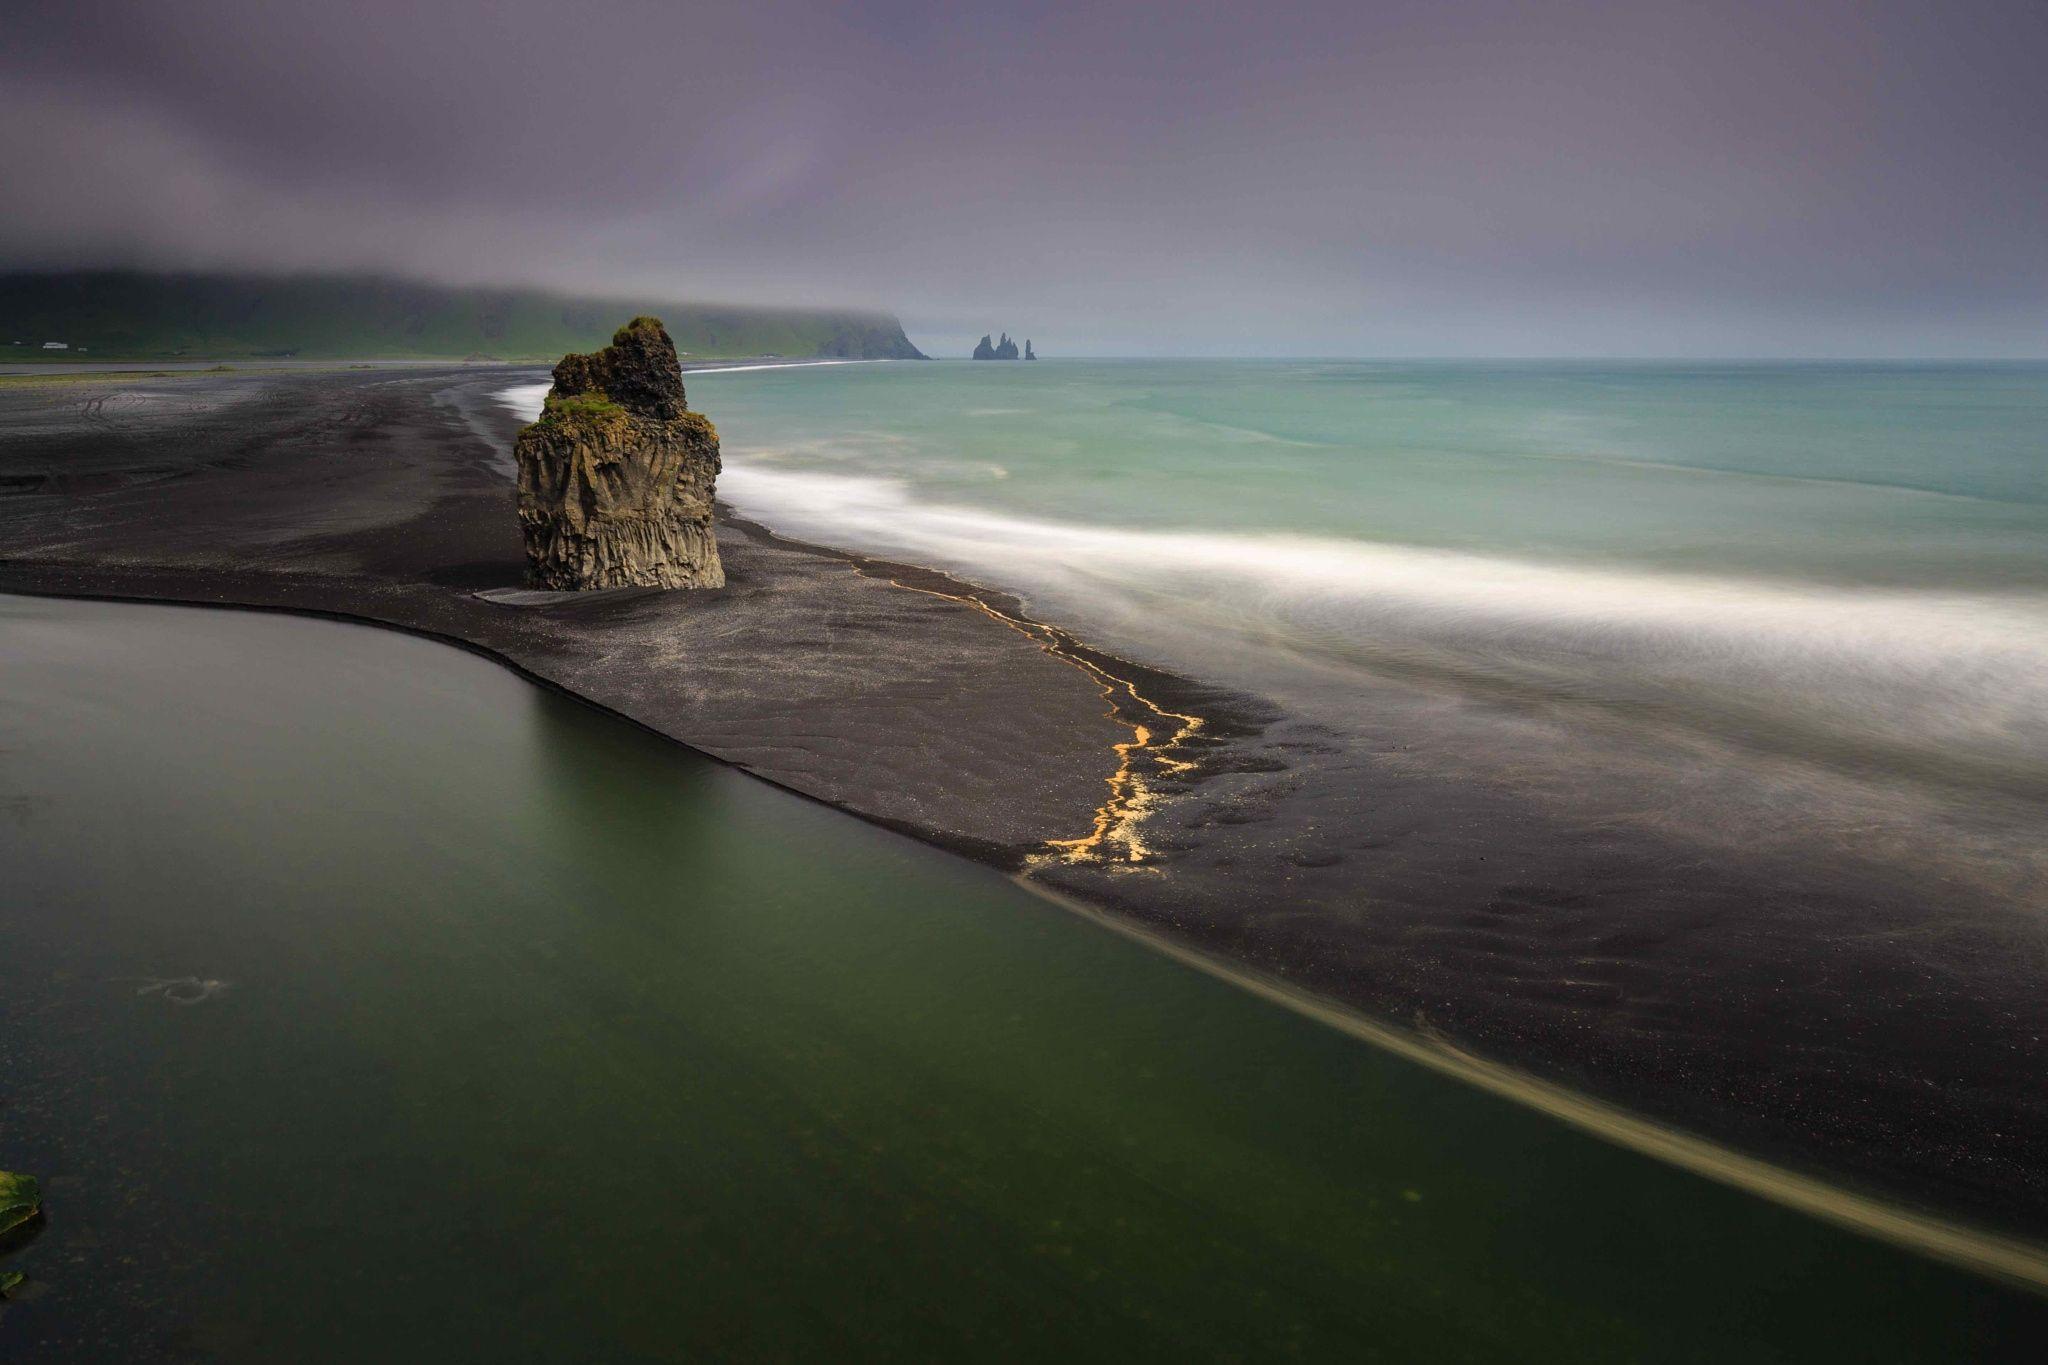 ICELAND - Dyrhólaey Black Beach - A beach of black lava sand, along the eastern cost, at Dyrhólaey.